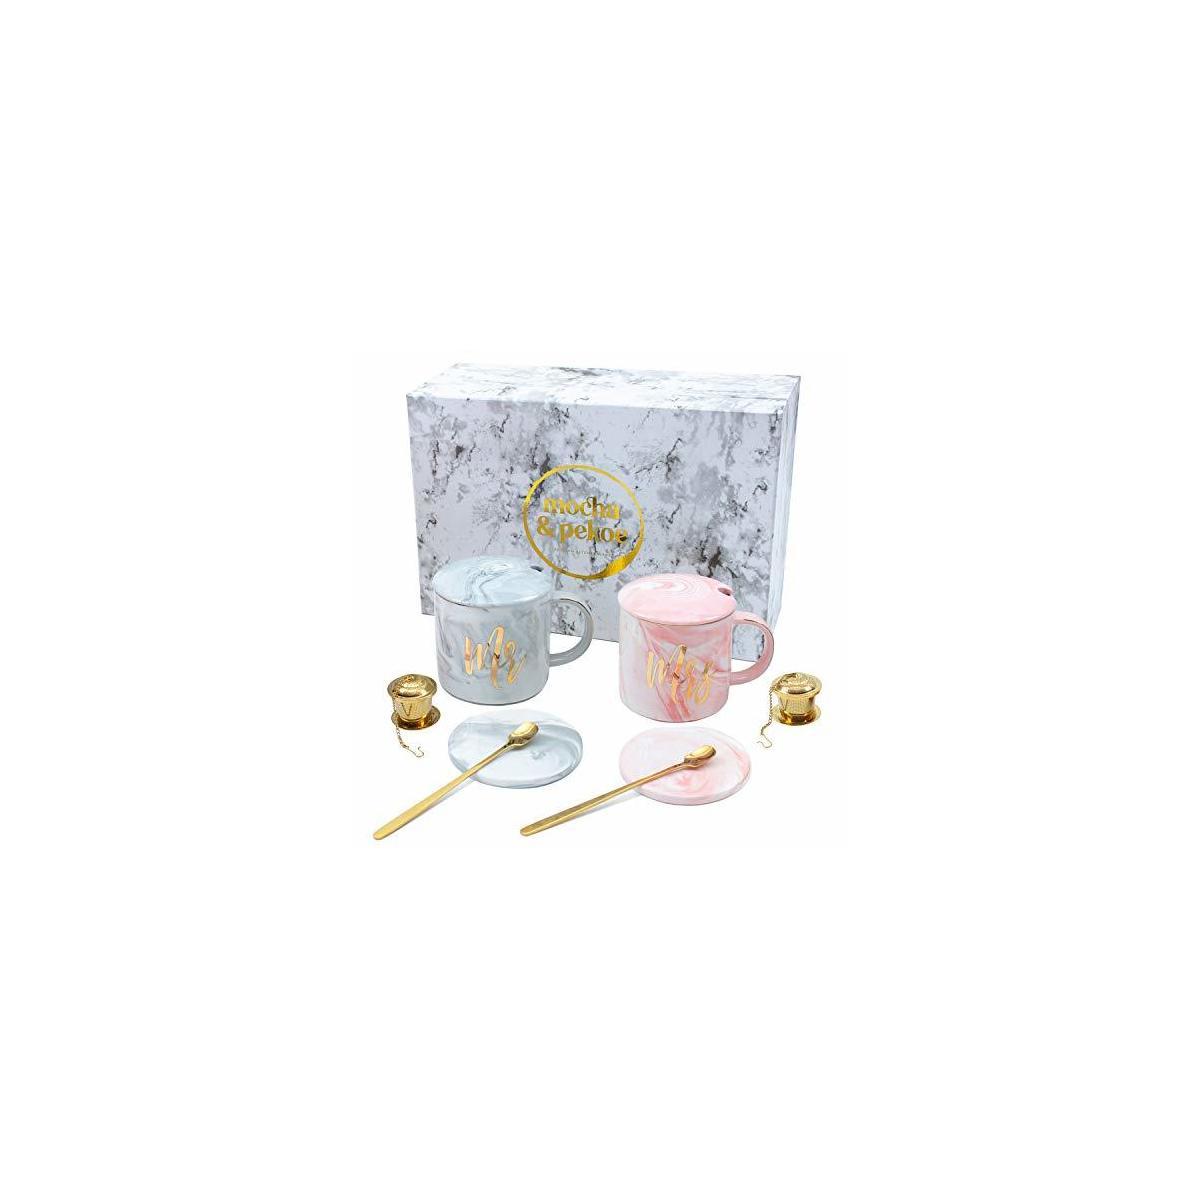 Cute Mr & Mrs Mugs Set w/ Gift Bag & Gift Box - Wedding Anniversary Bridal Shower Engagement Housewarming His Her Coffee & Tea Couples Gifts